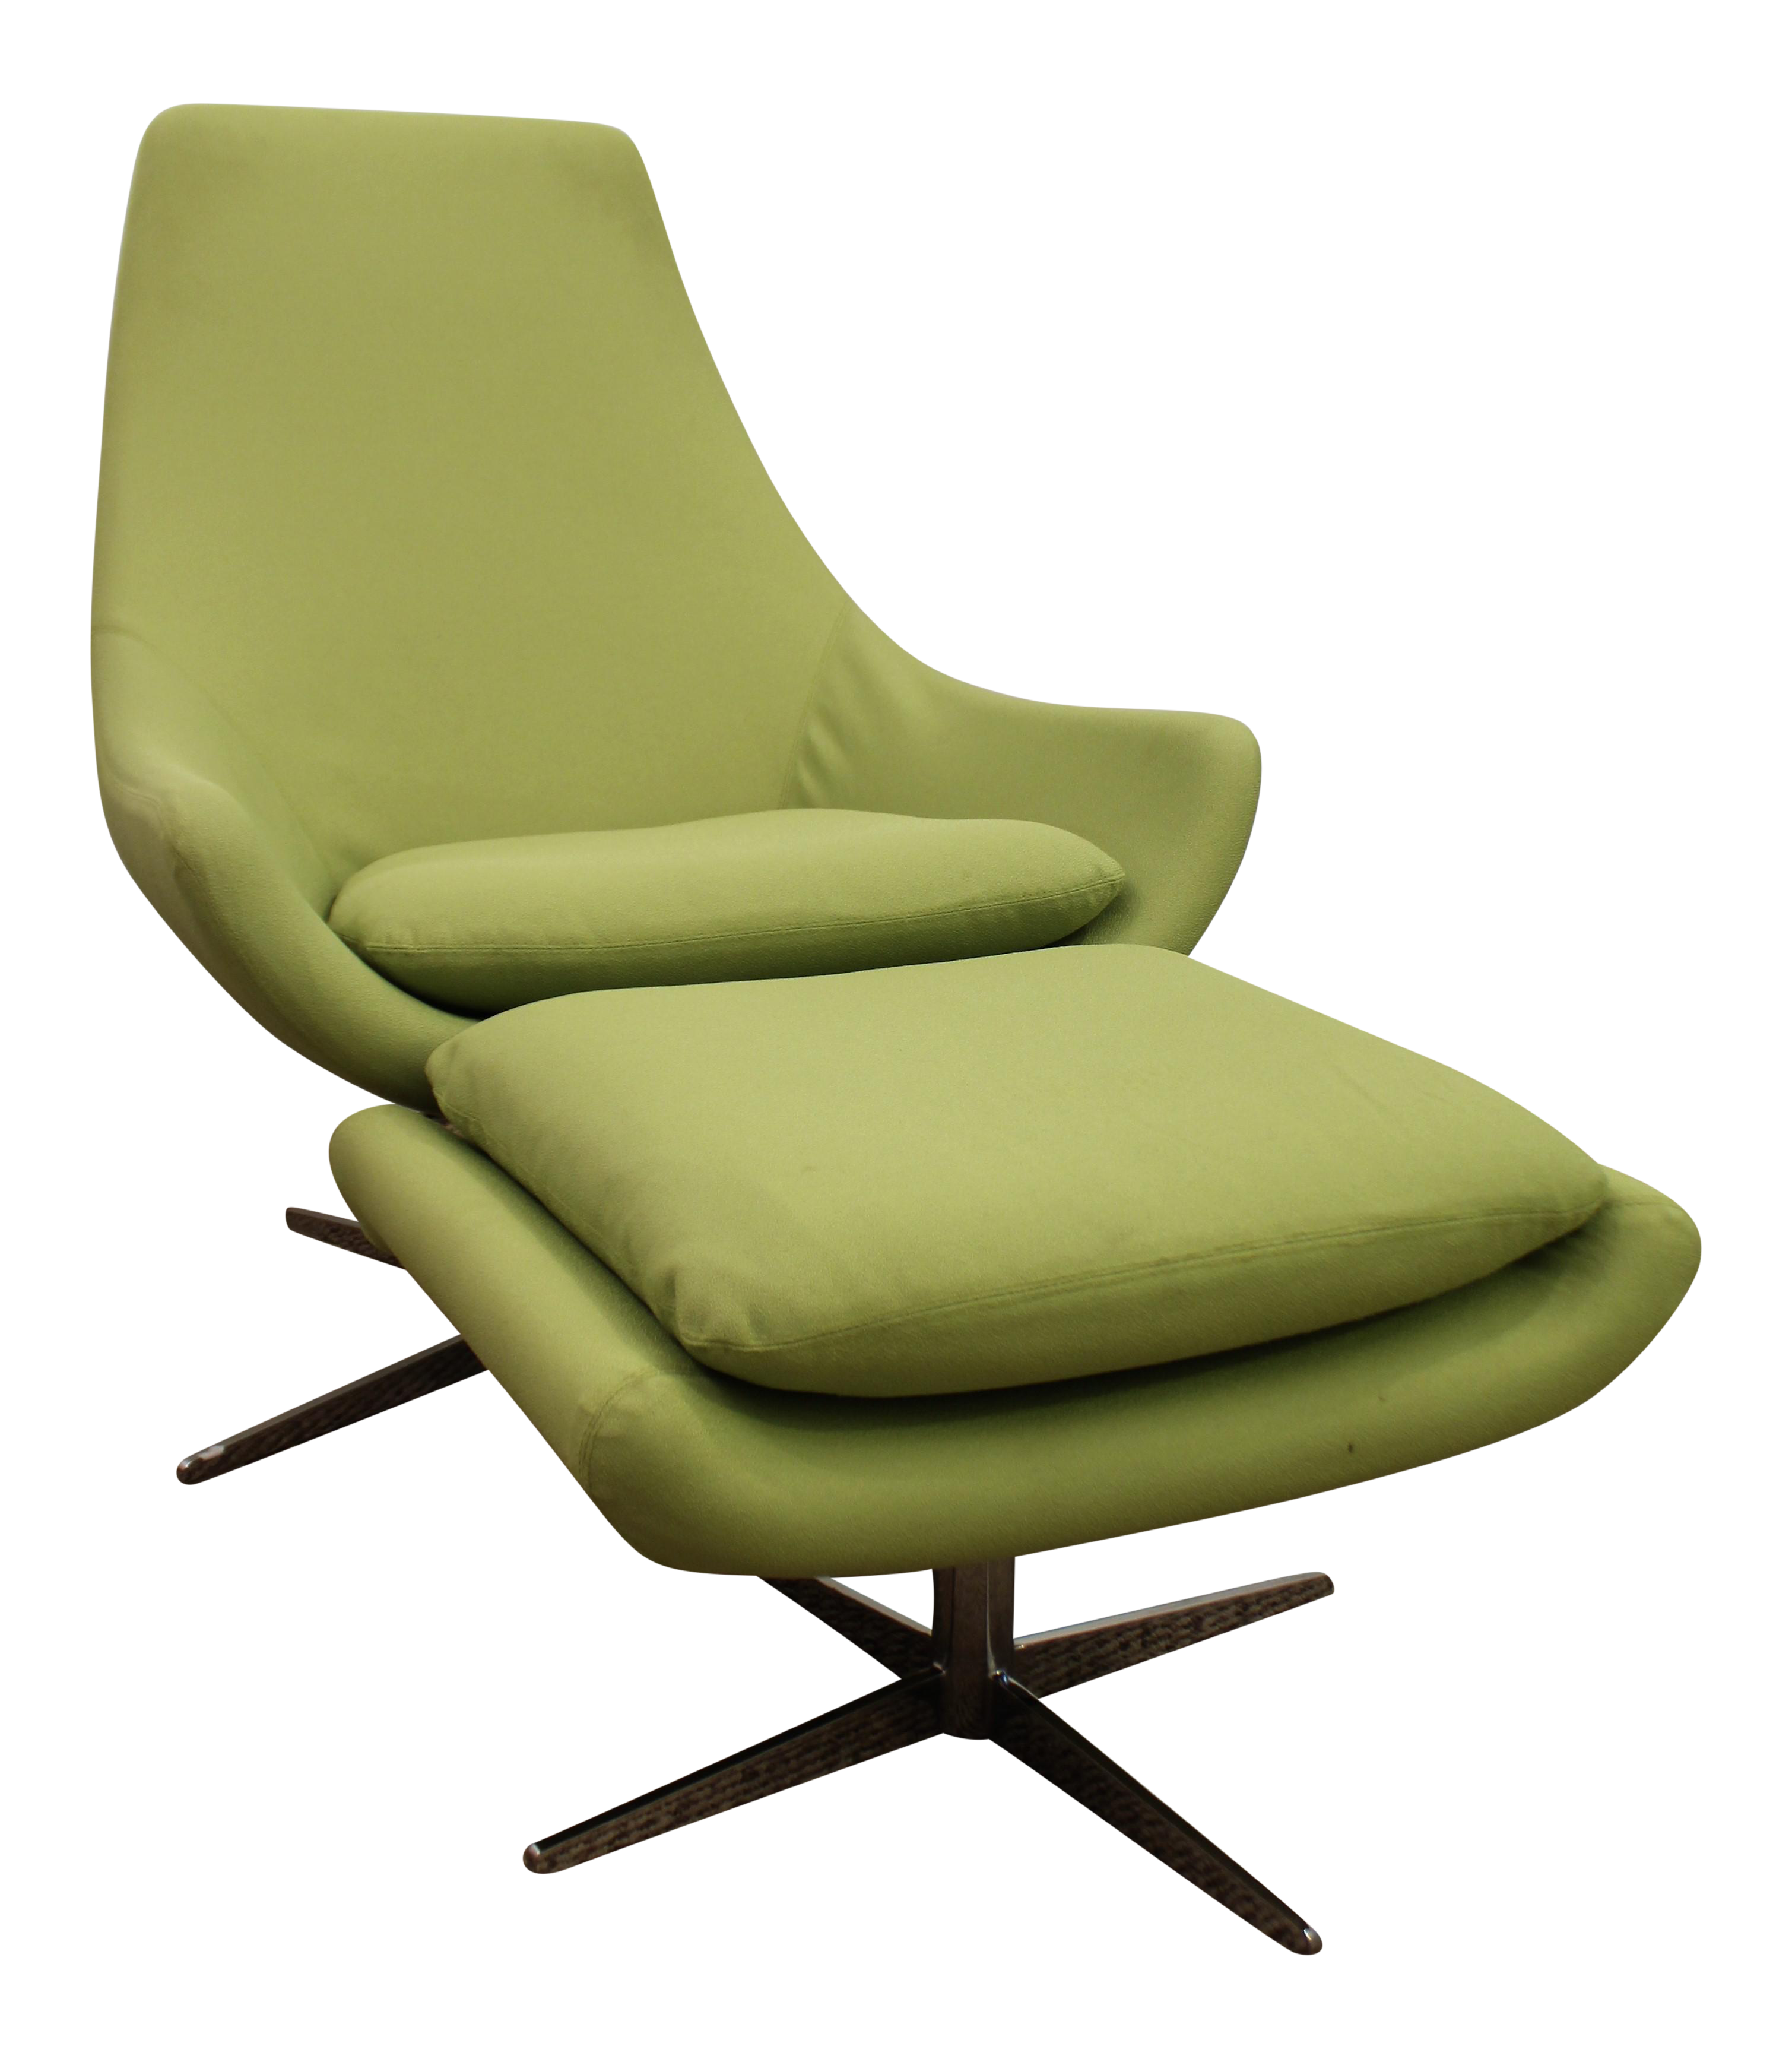 Mid Century Danish Modern Lime Green Swivel Lounge Chair Ottoman Chairish